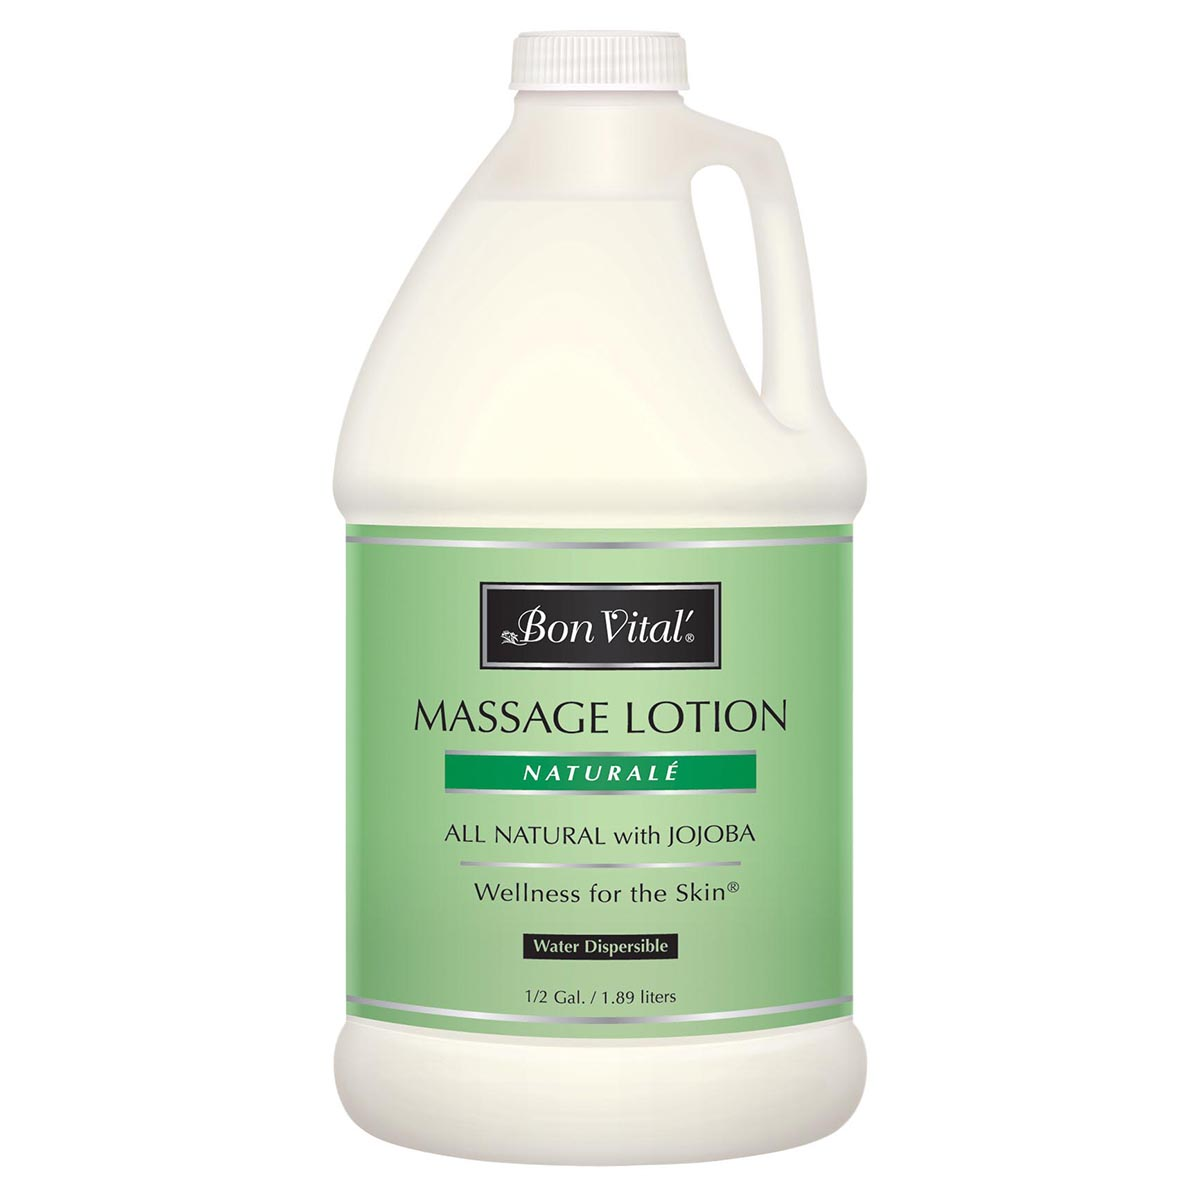 Bon Vital Natural Massage Lotion  Massage Lotions Oils